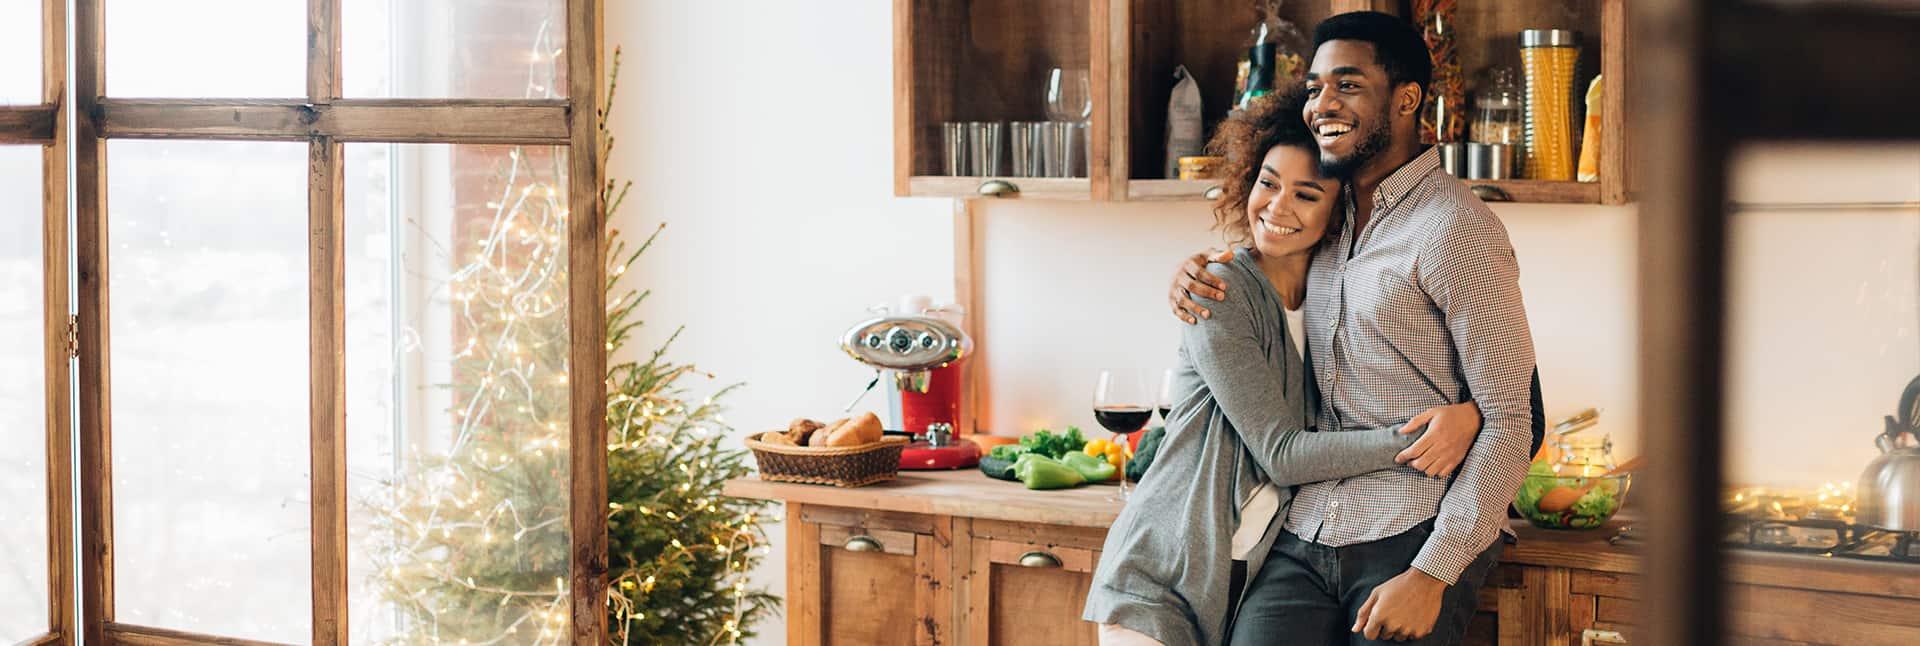 homeowners insurance 1